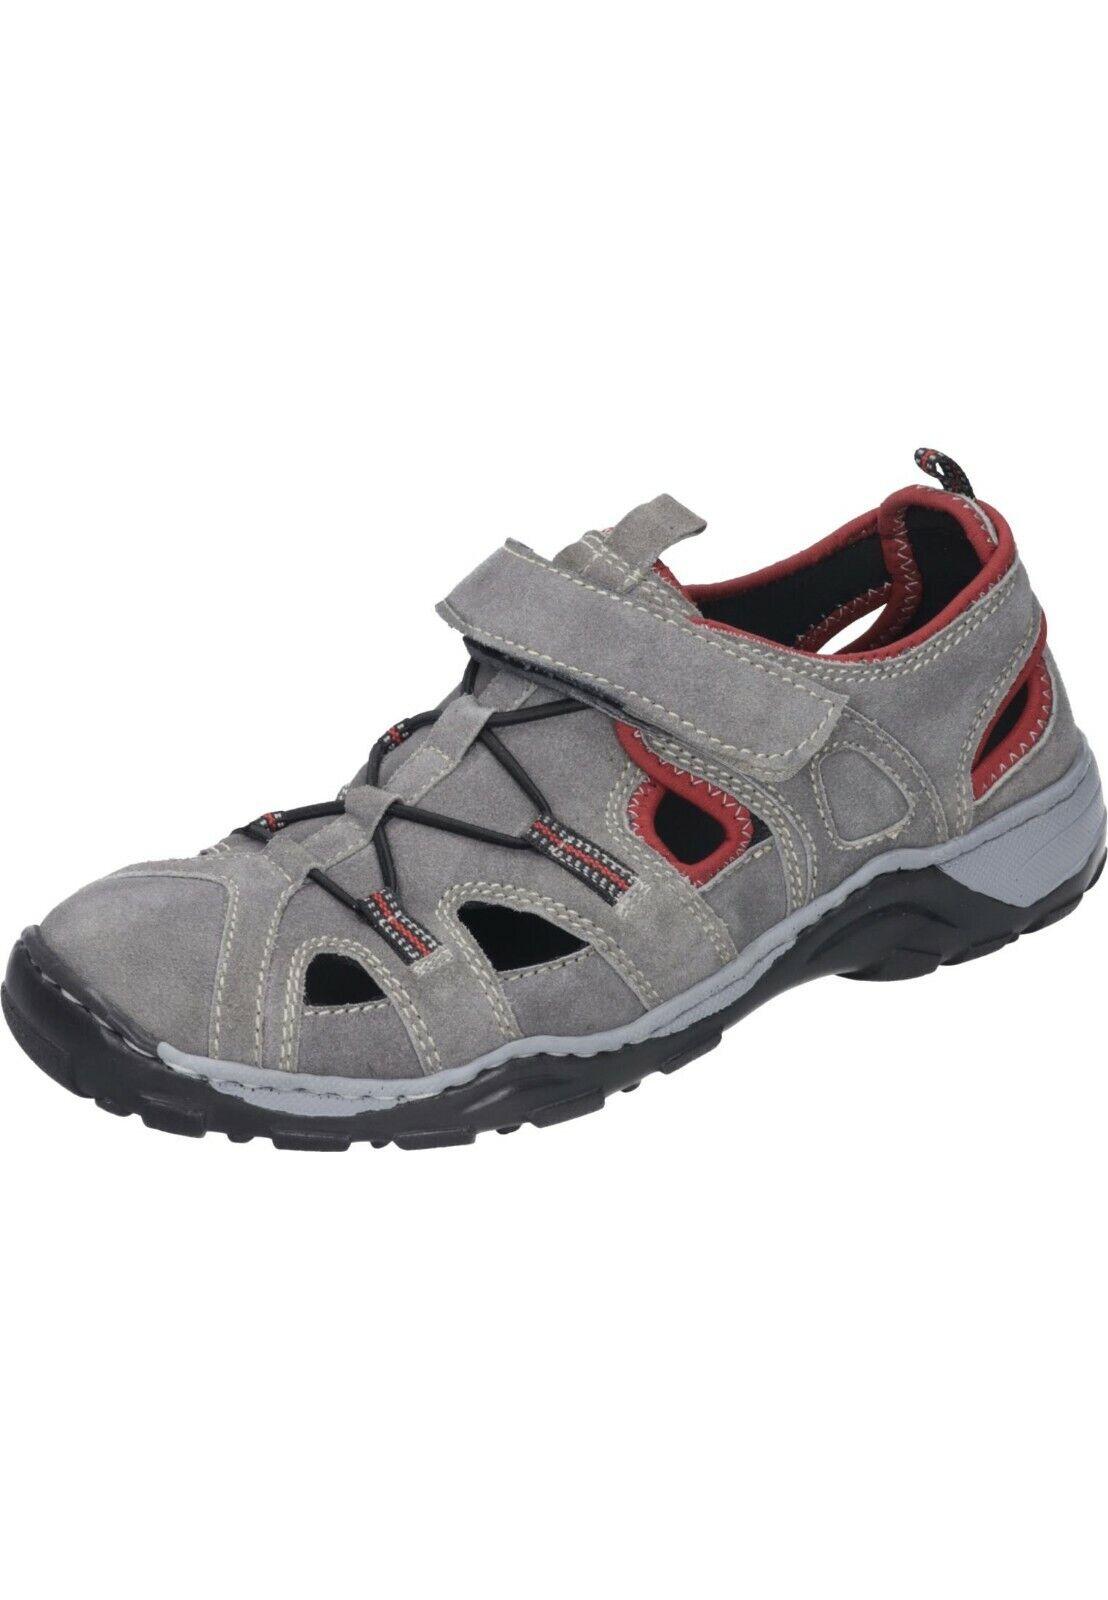 Manitu Sandals Leather Flat Trekking shoes Beige Red 40-46 620232 -8 Neu5